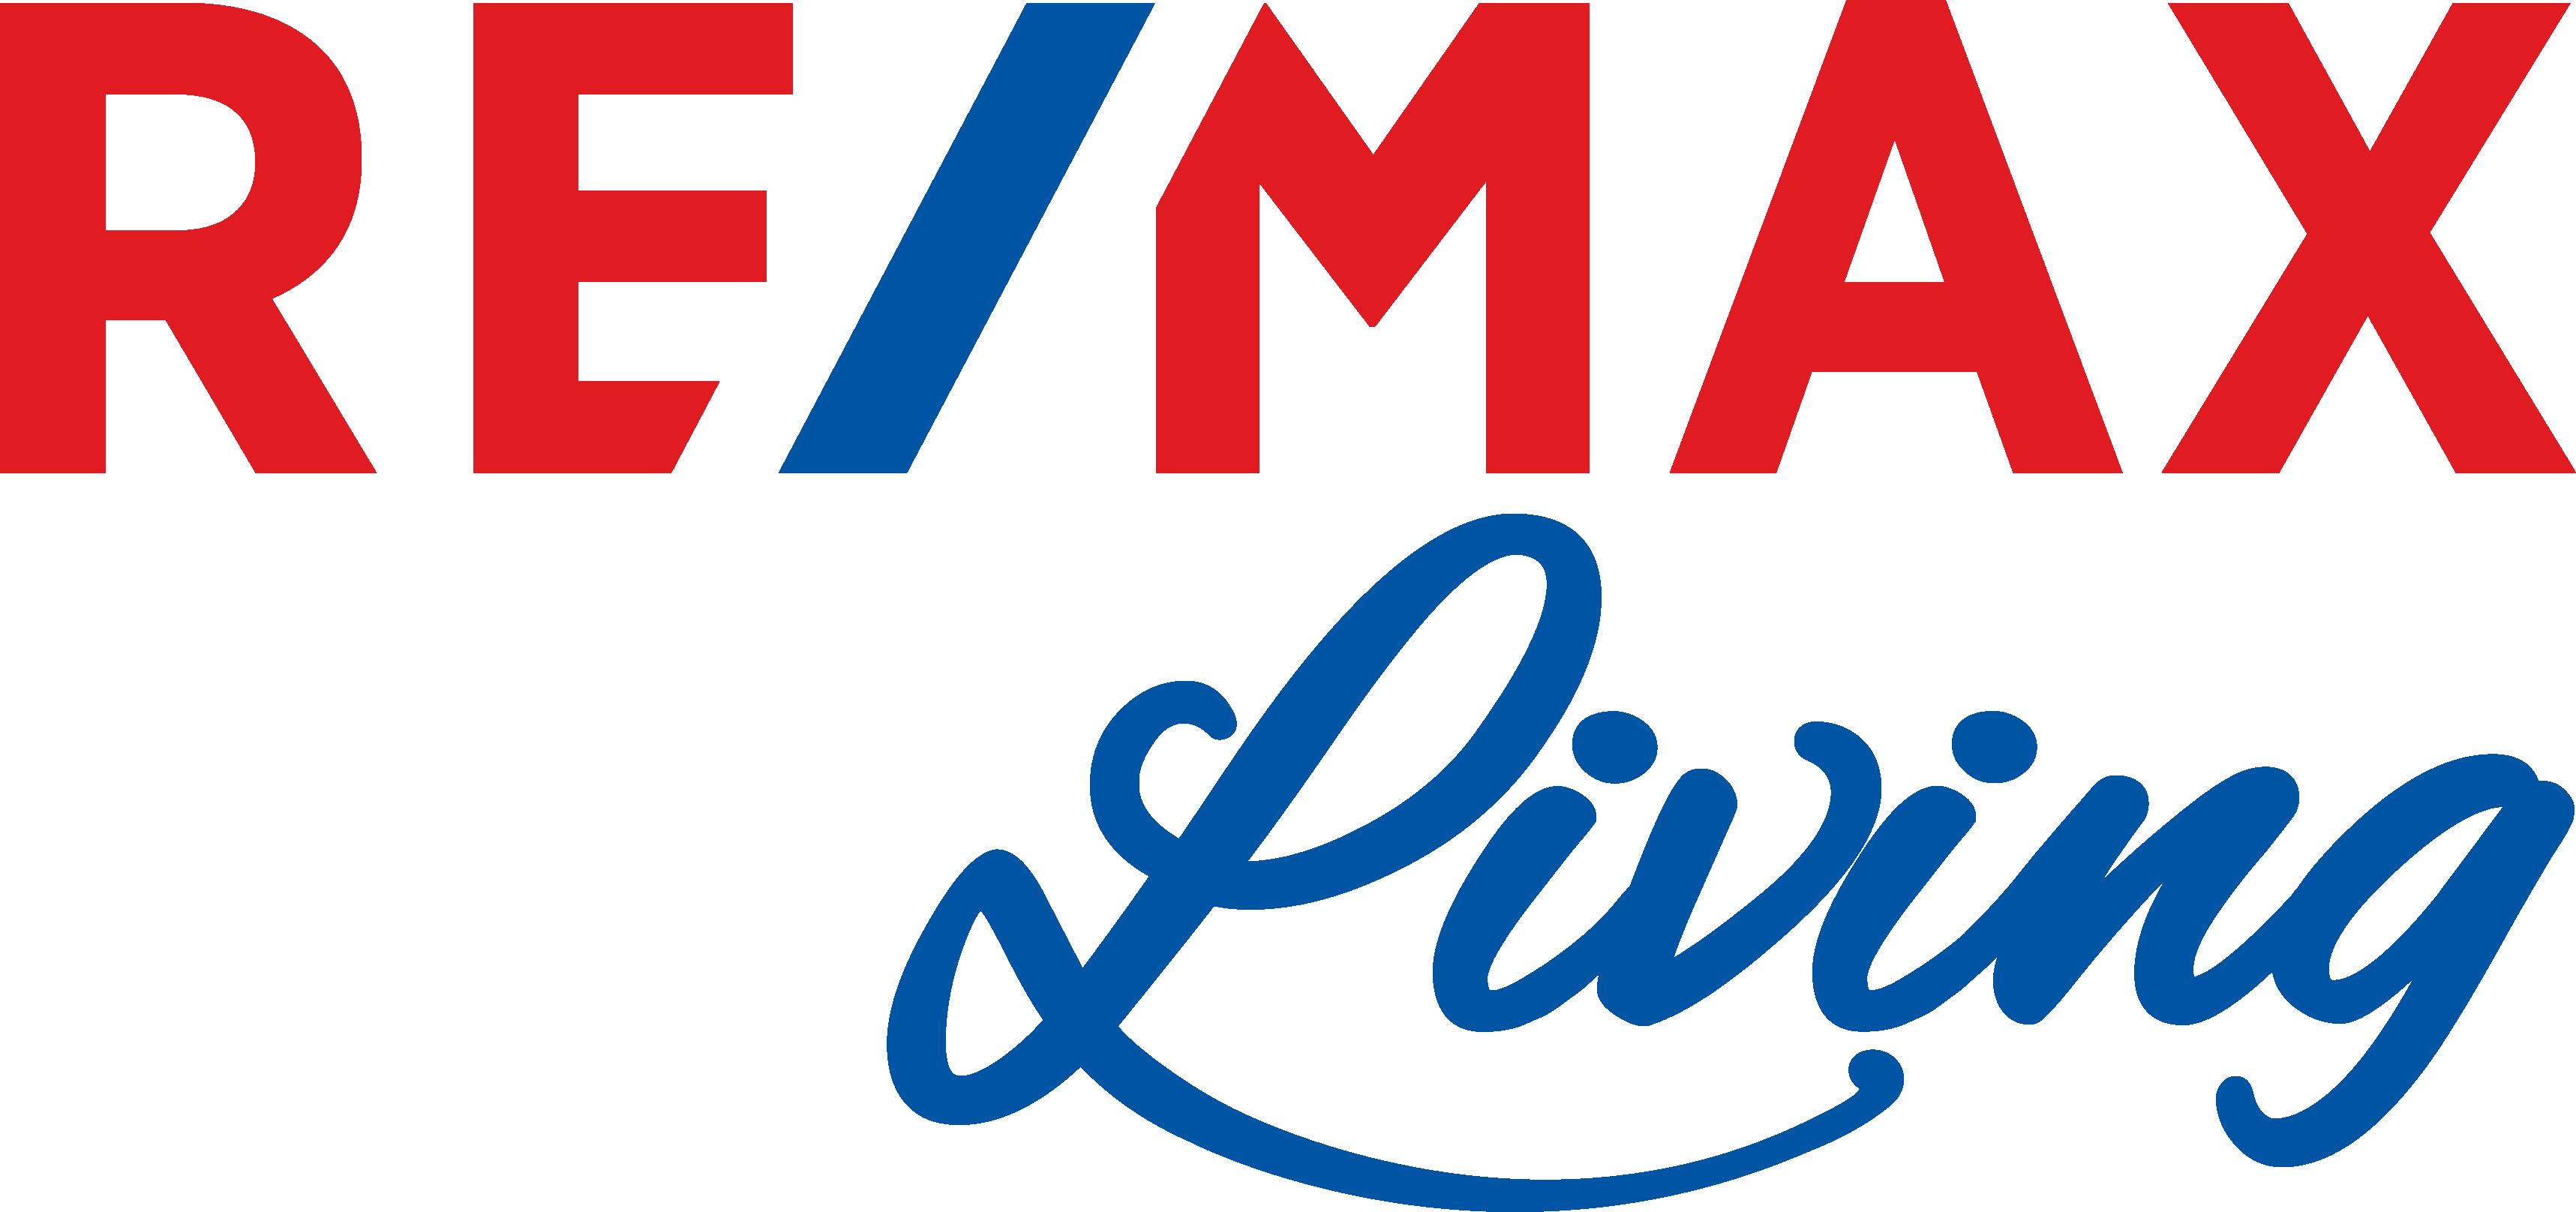 Fairfax meadow logo